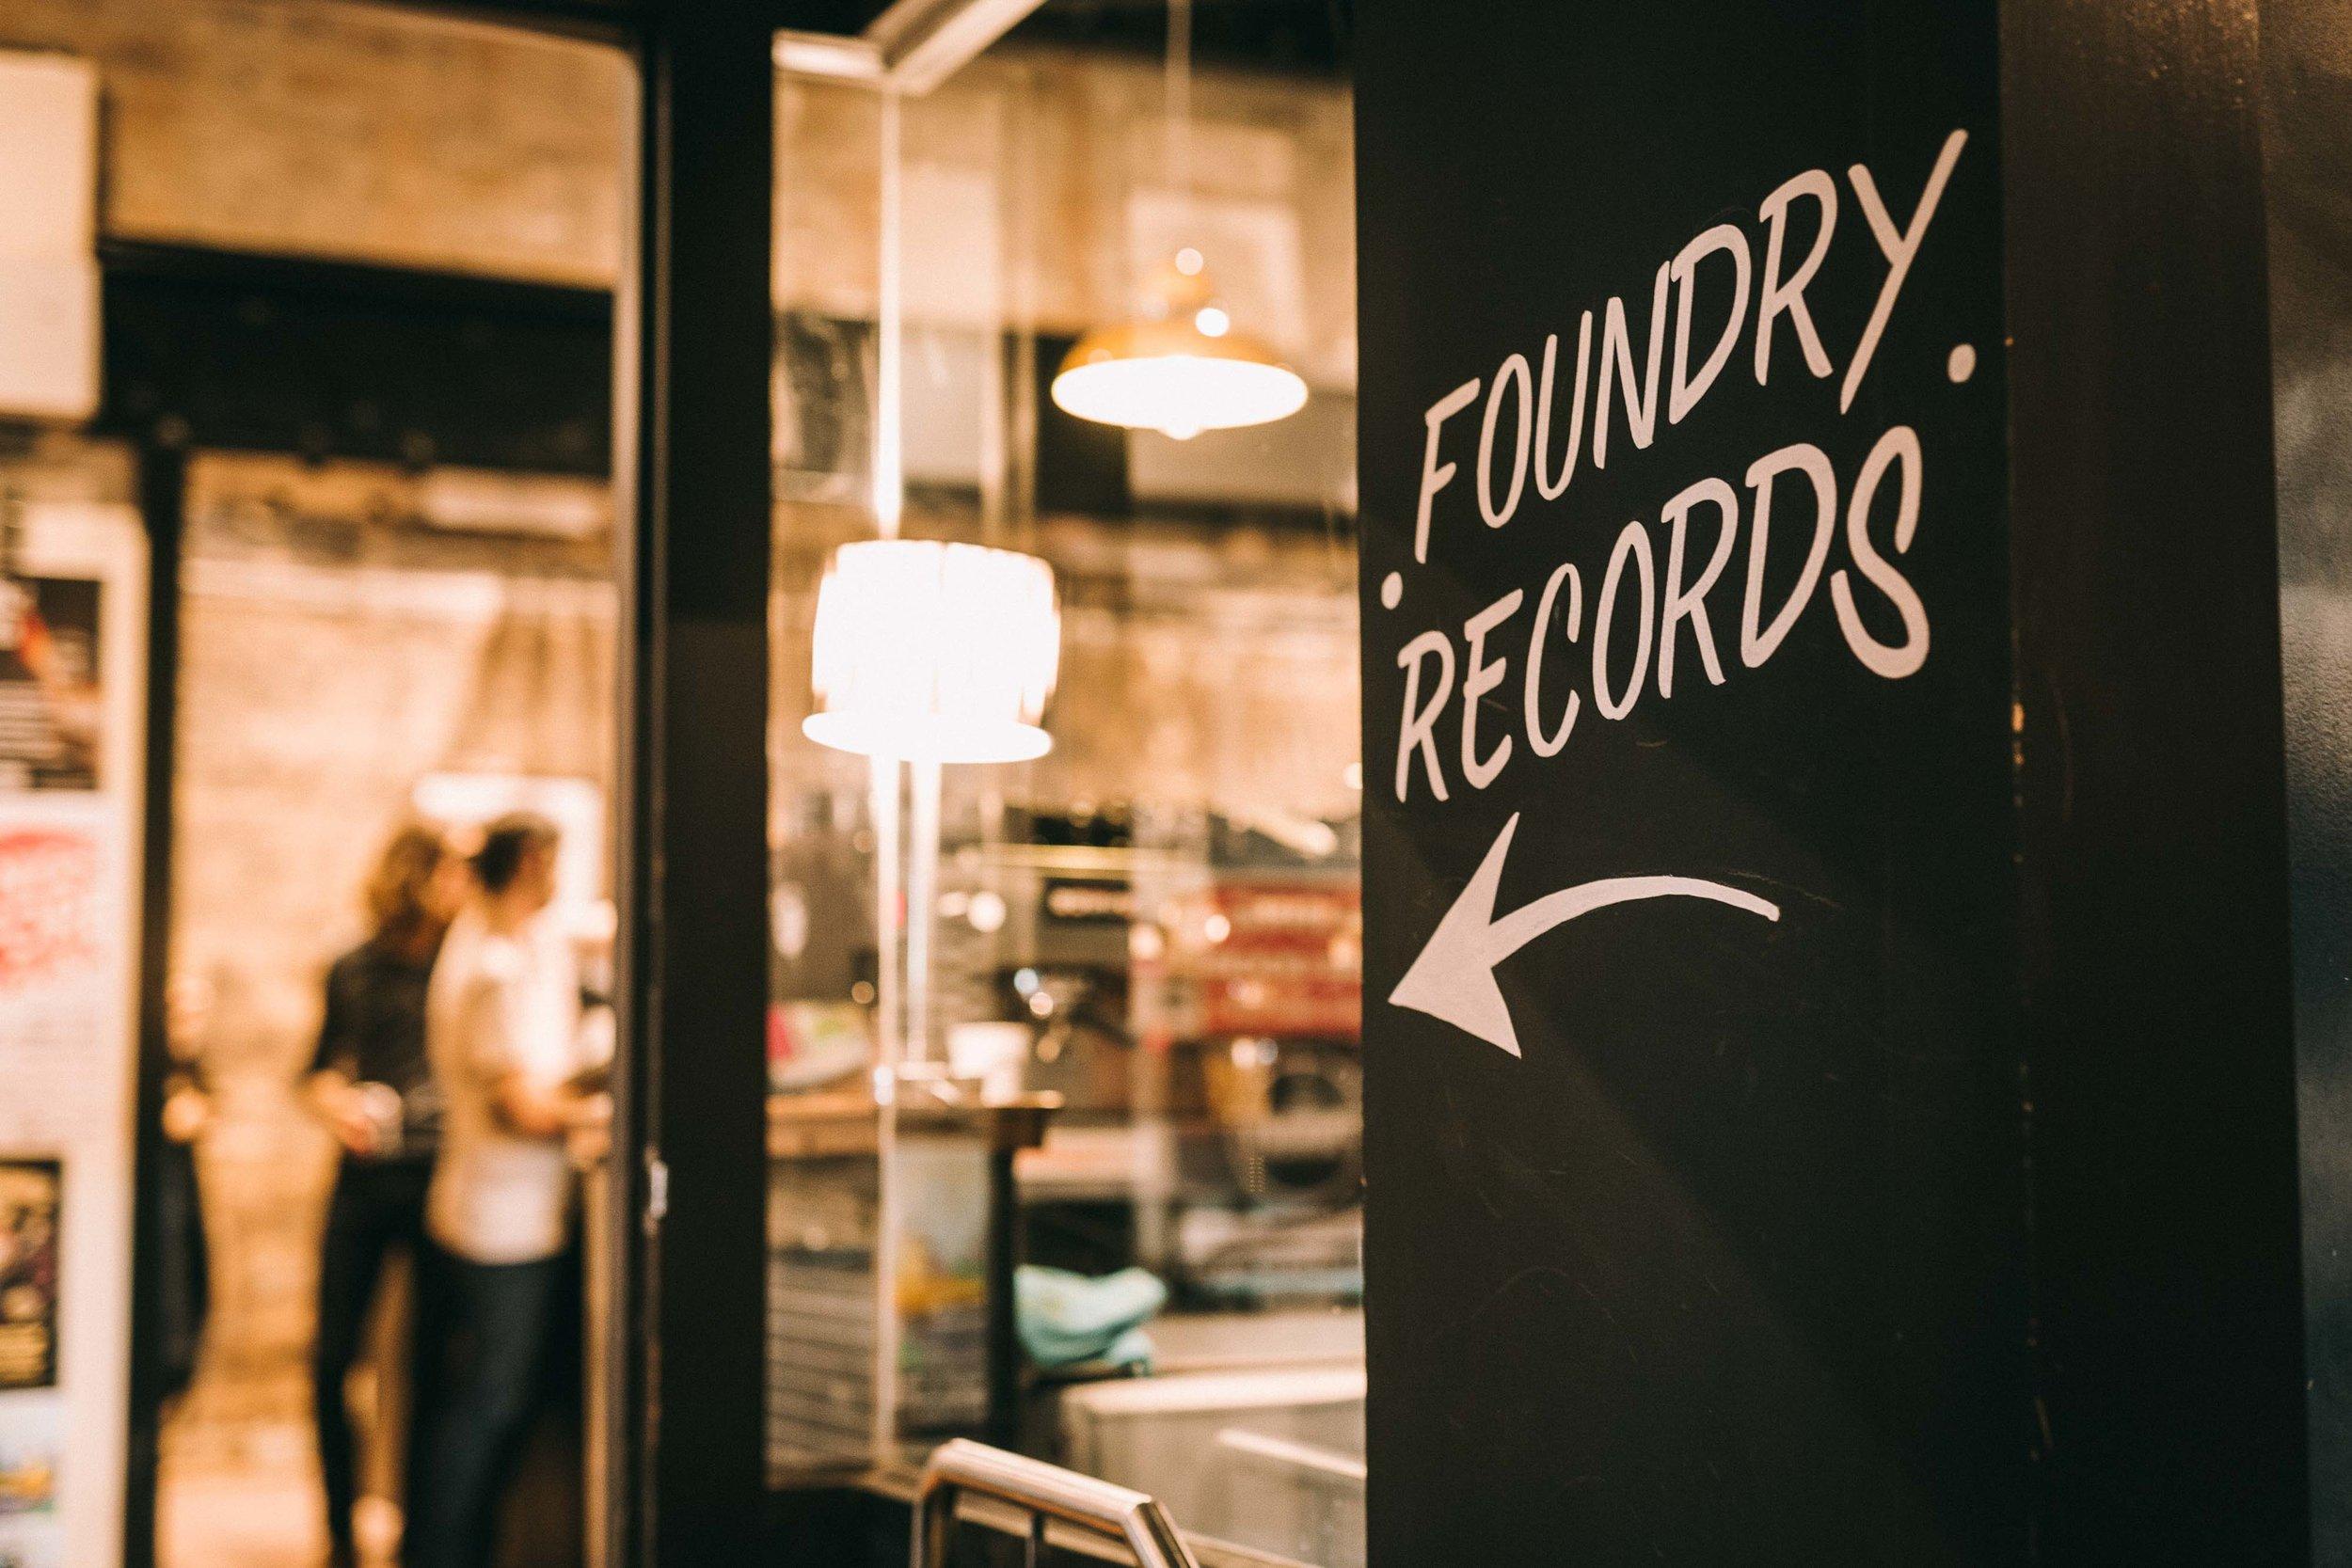 FOUNDRY RECORDS